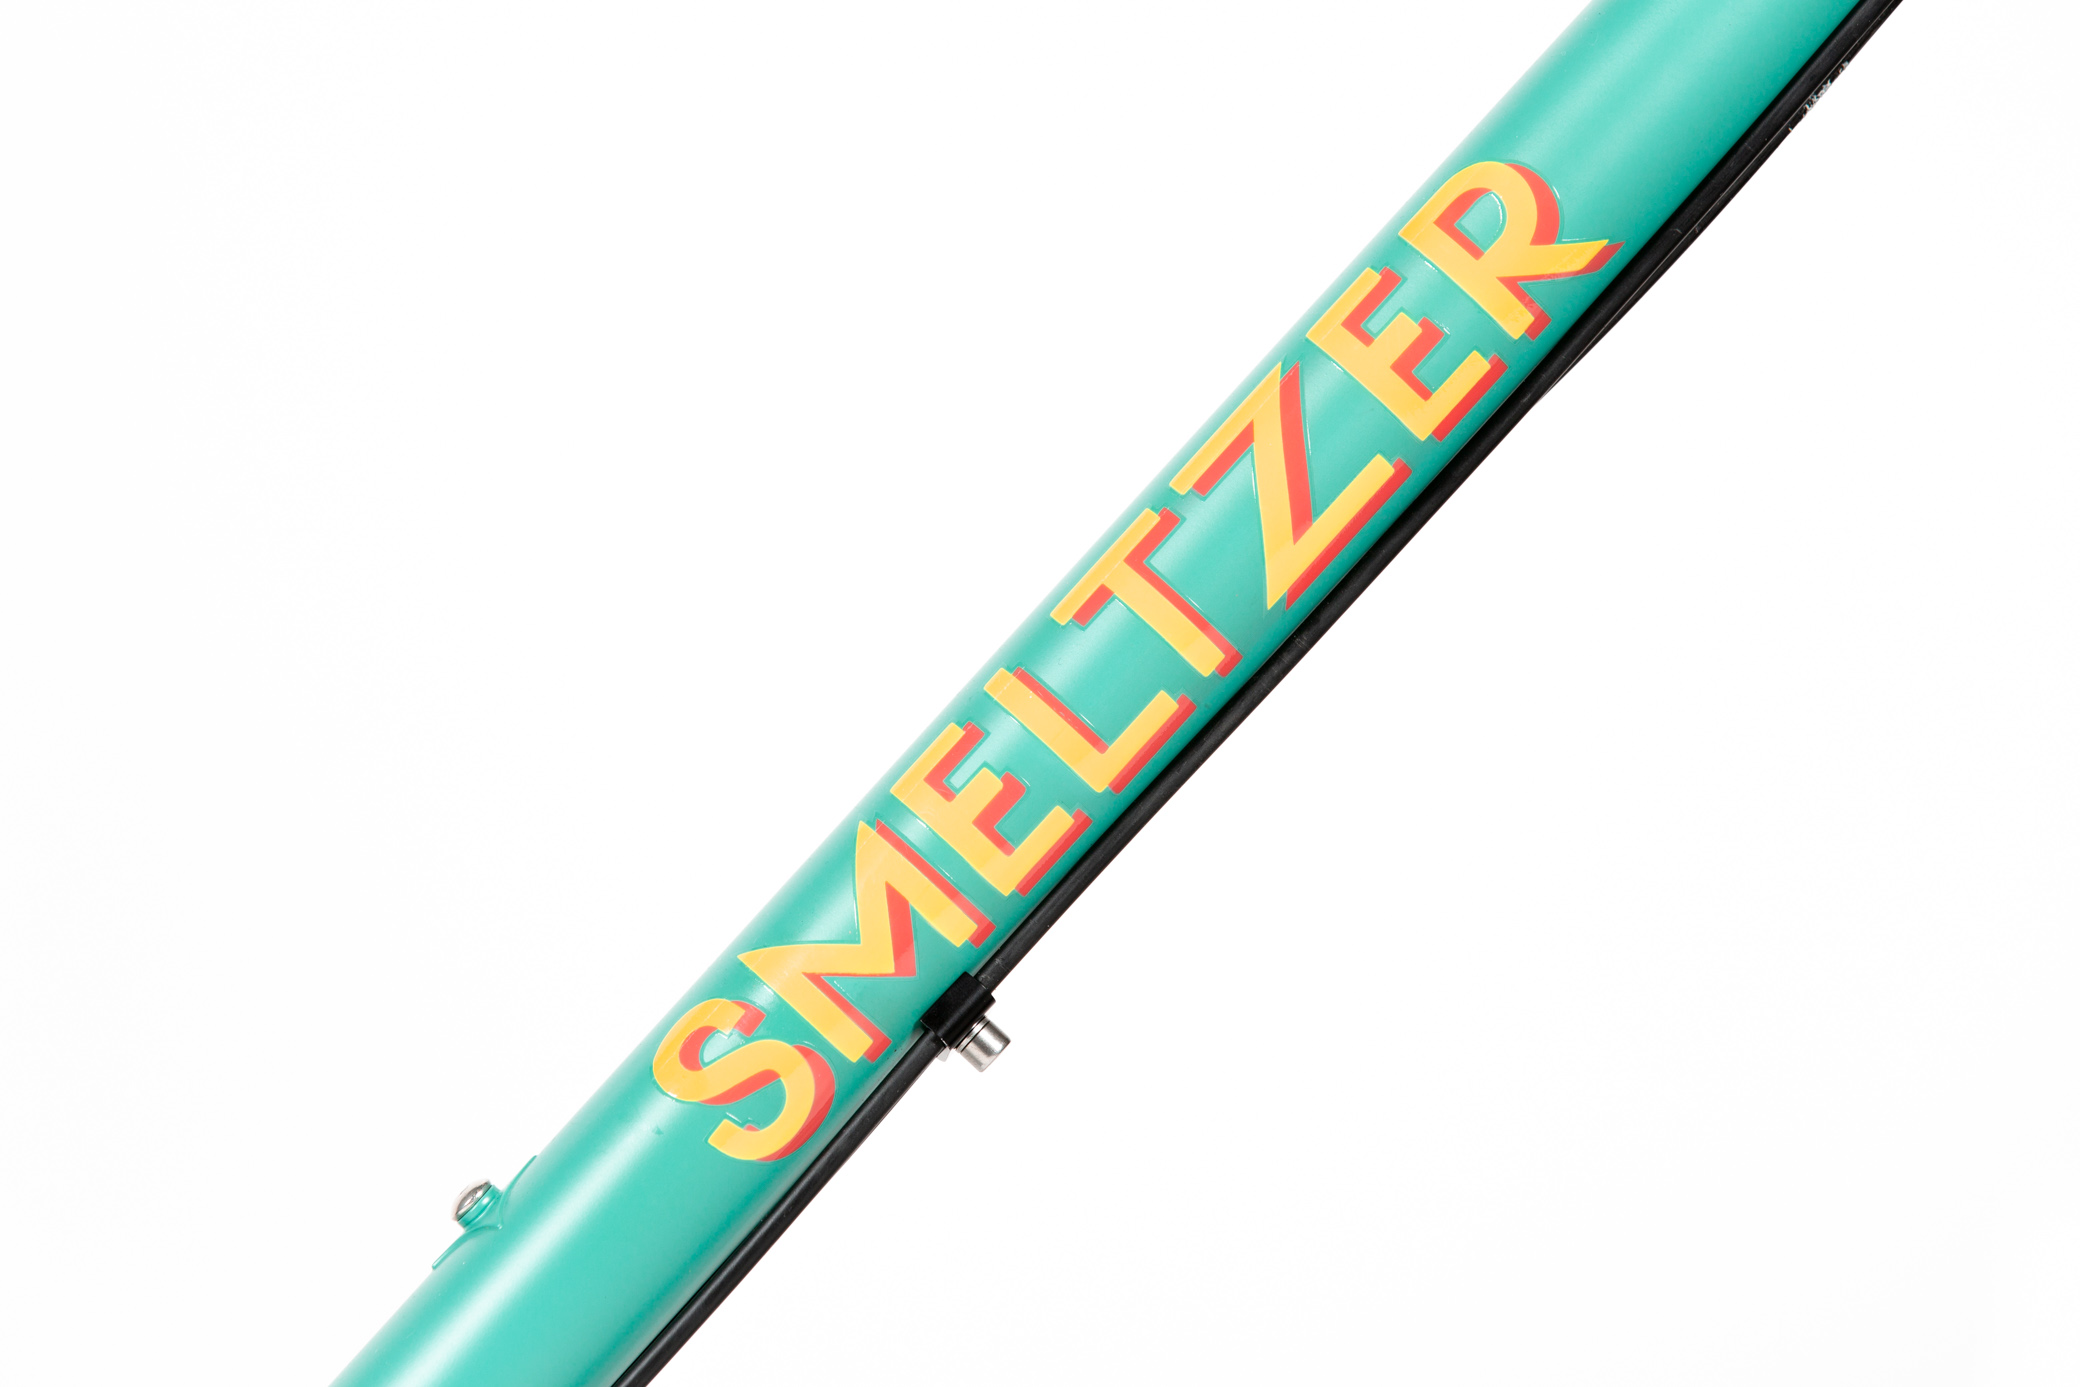 Smetlzer MTB 3.jpg